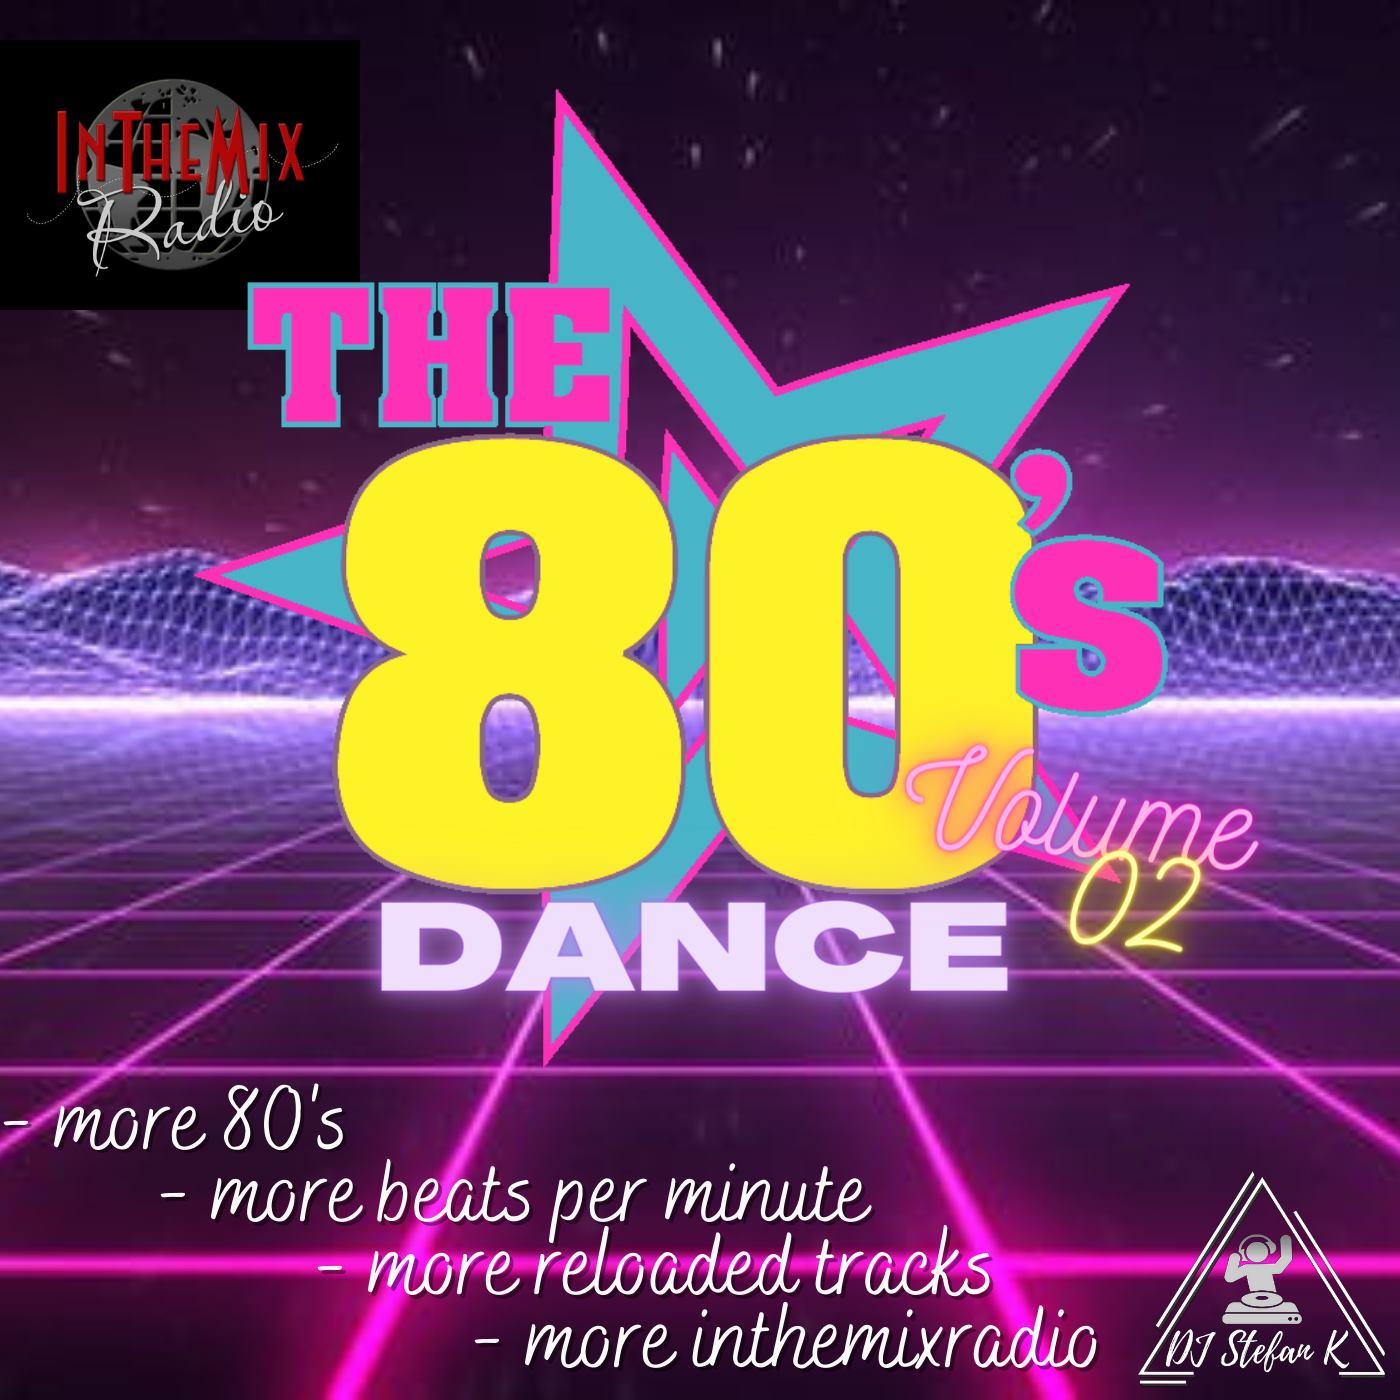 The 80's Dance 2